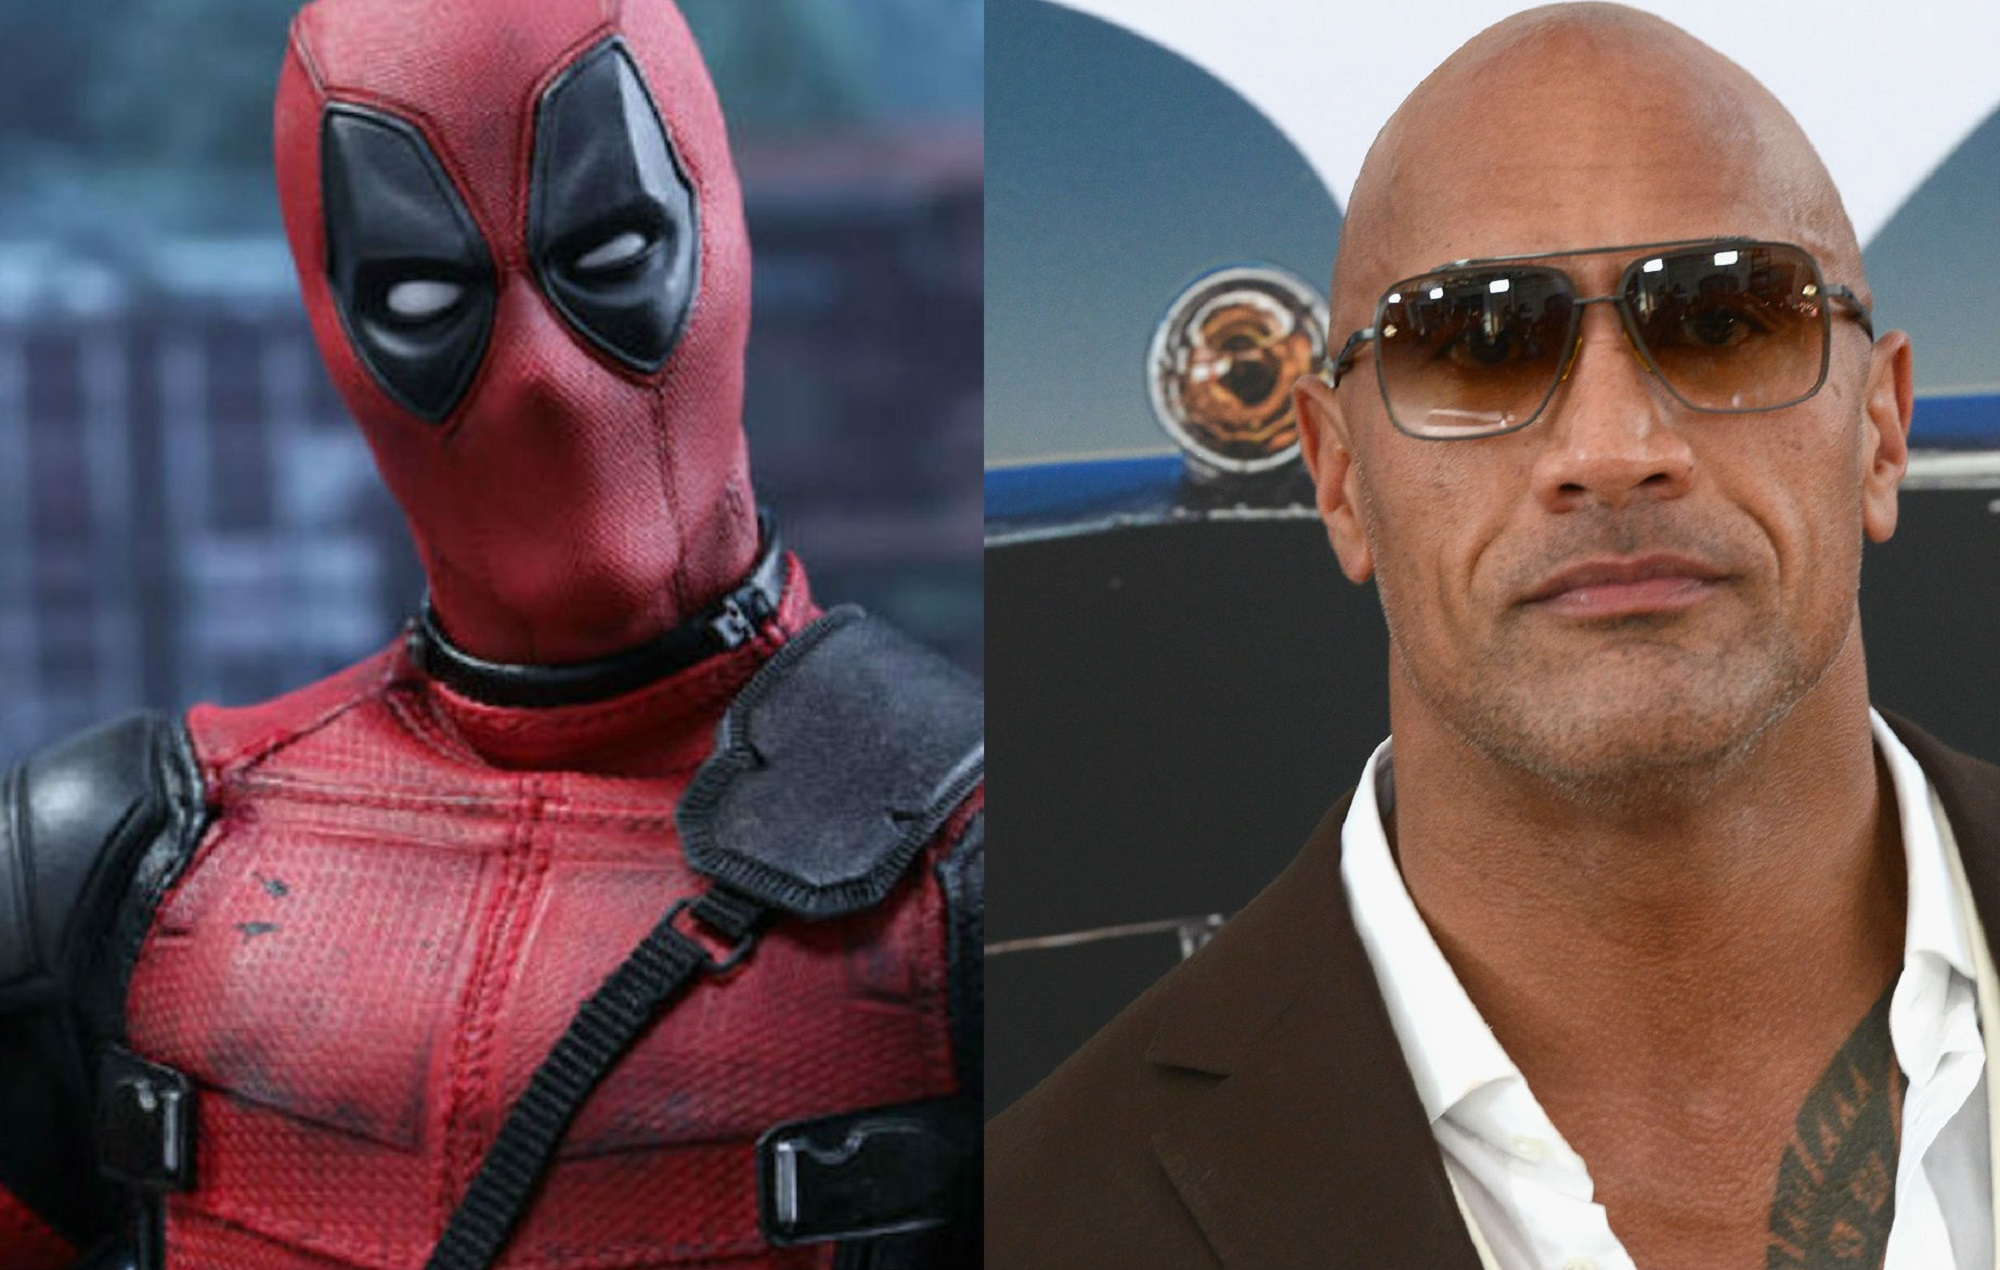 Deadpool and Dwayne Johnson